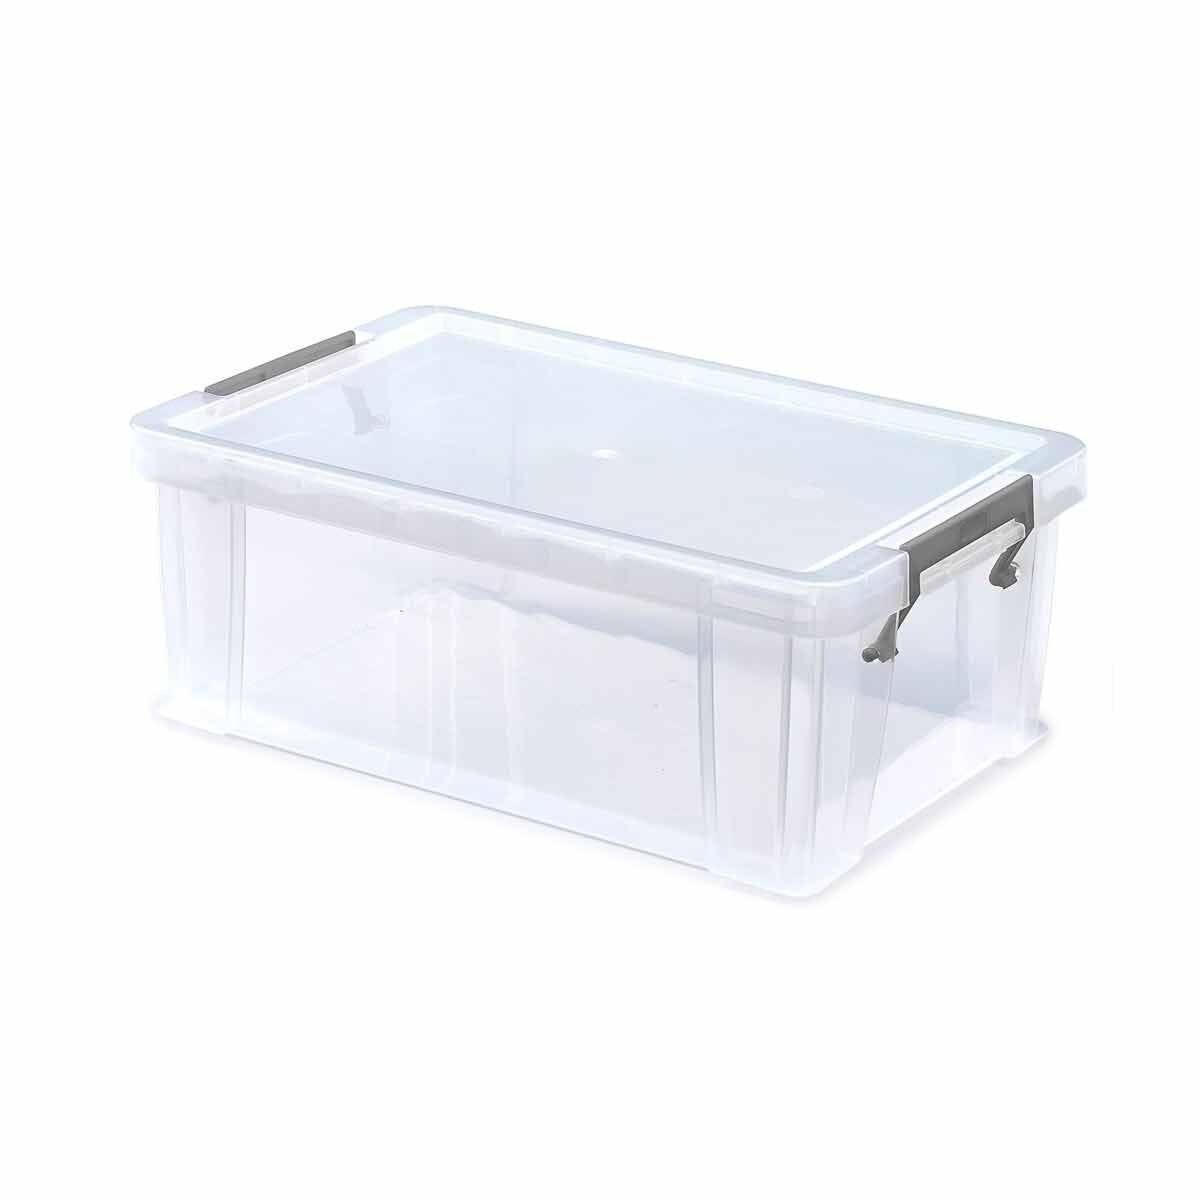 Whitefurze Allstore Plastic Storage Box 10 Litre